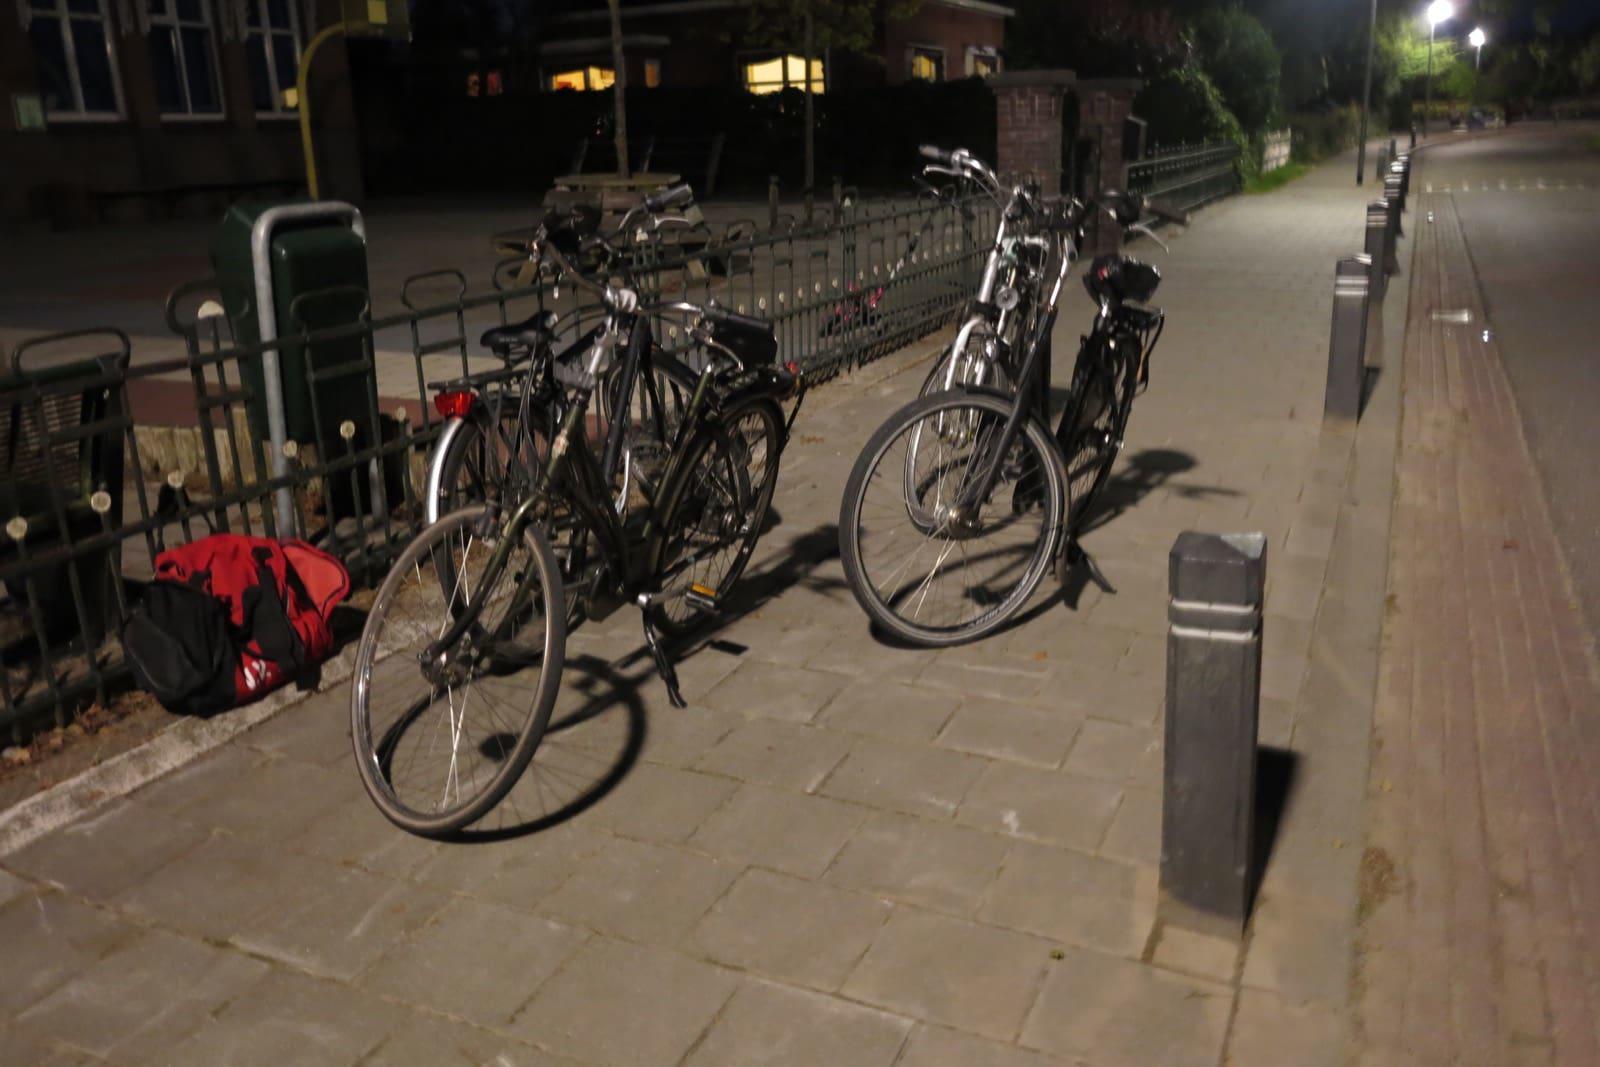 et-fiets-en-fietser-85-hangjeugd-bij-schoolplein-oi.jpg